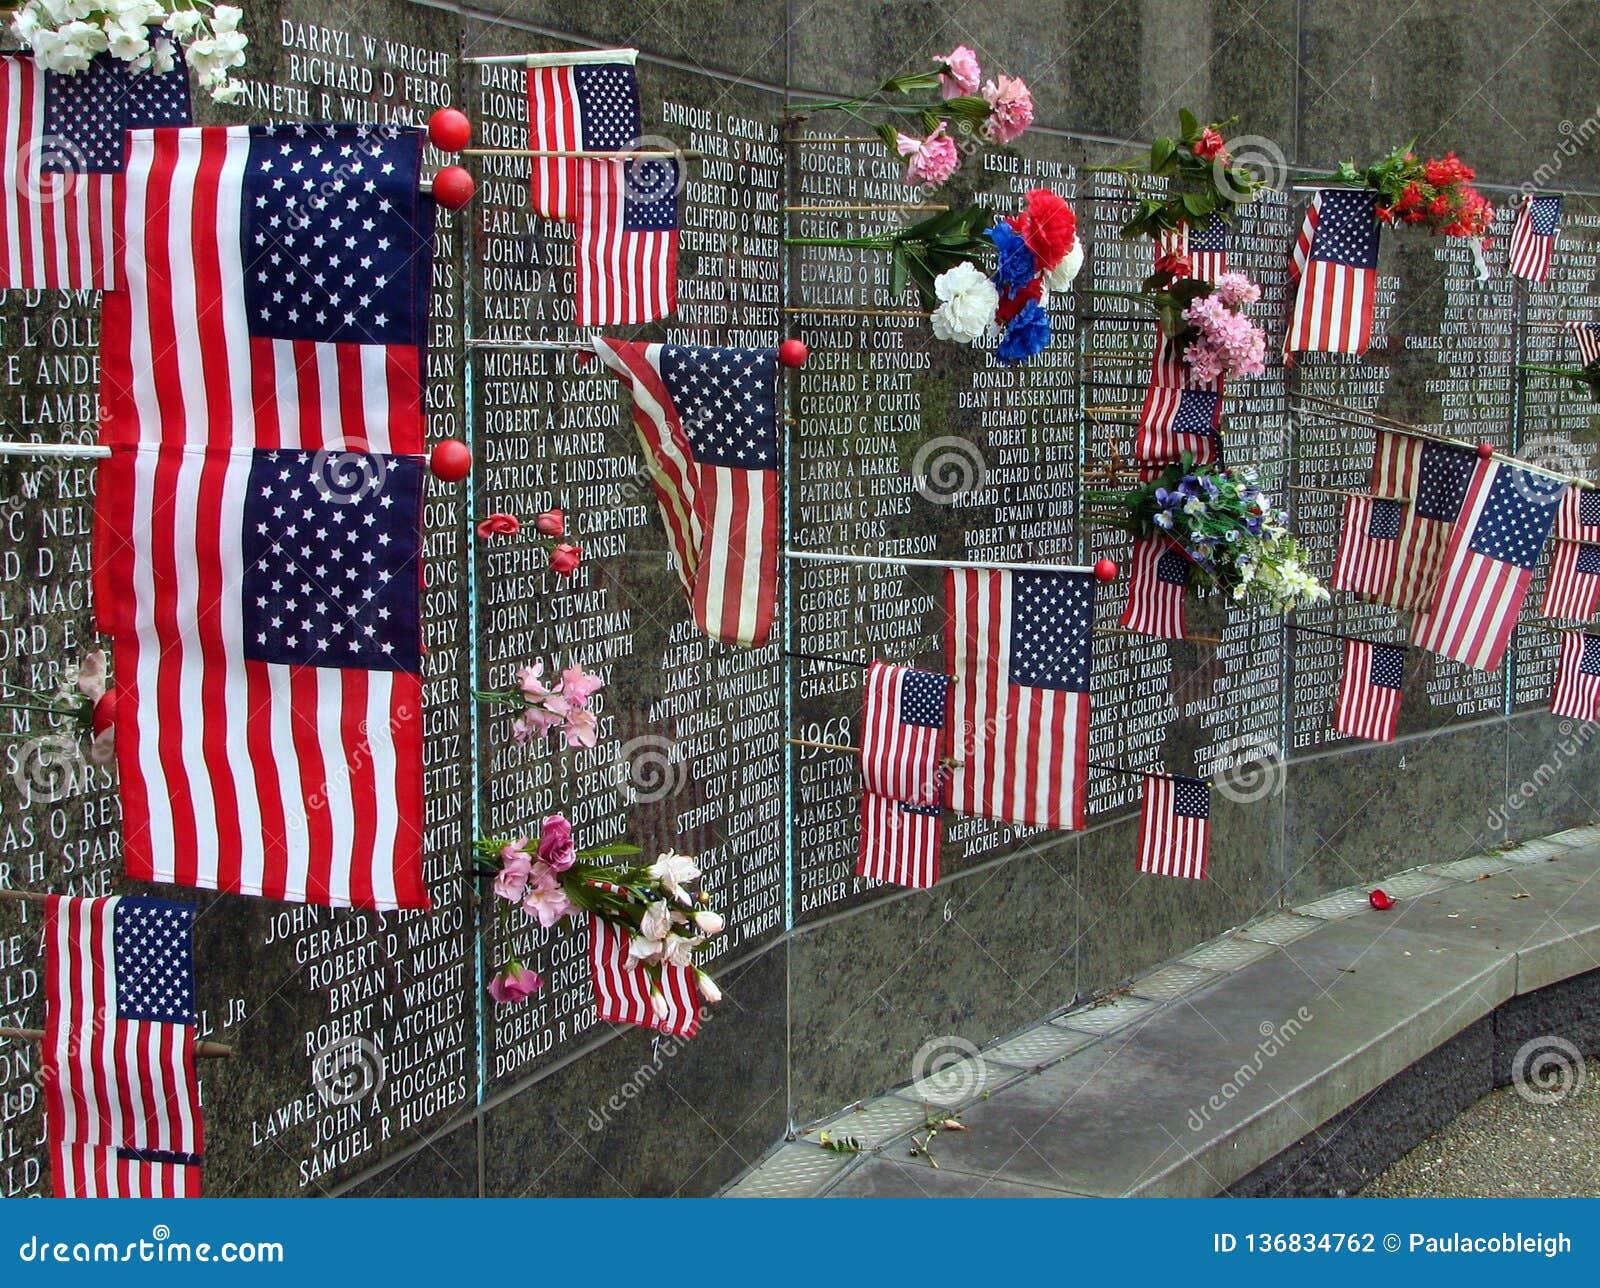 Washington State Vietnam War Memorial at the capitol, Olympia